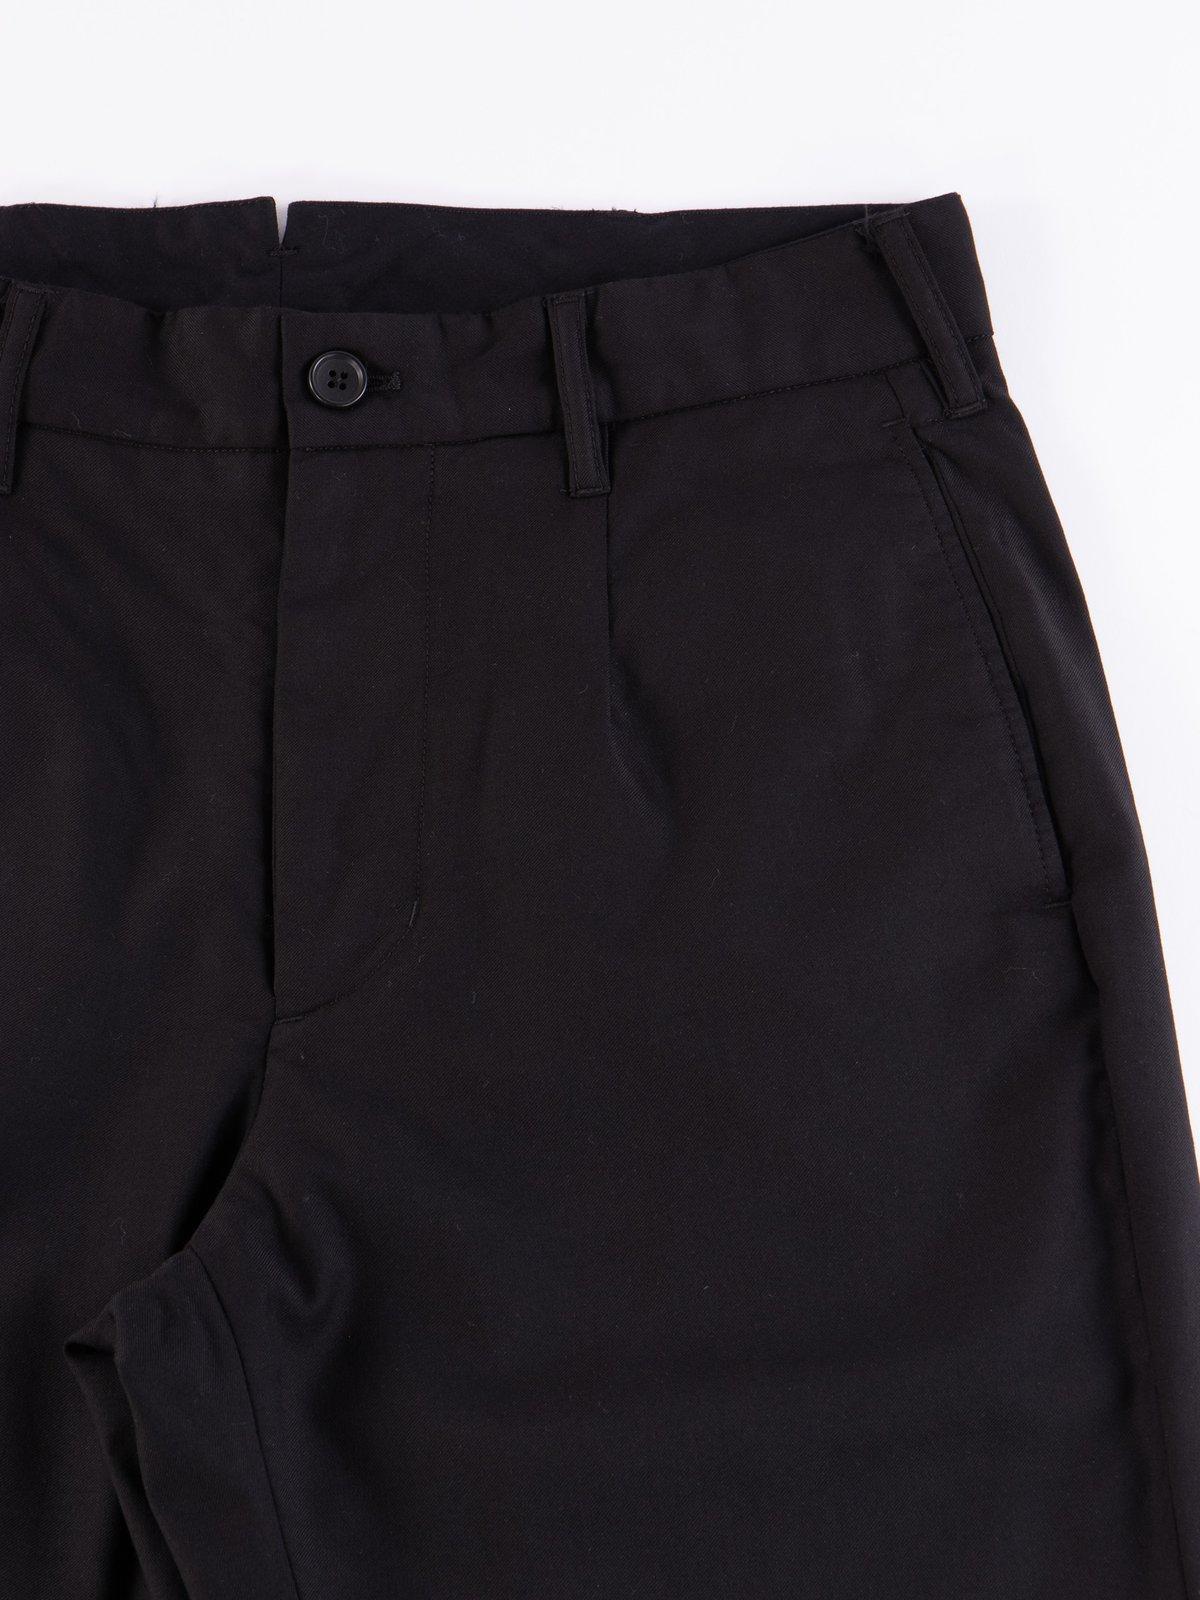 Black Worsted Wool Gabardine Andover Pant - Image 3